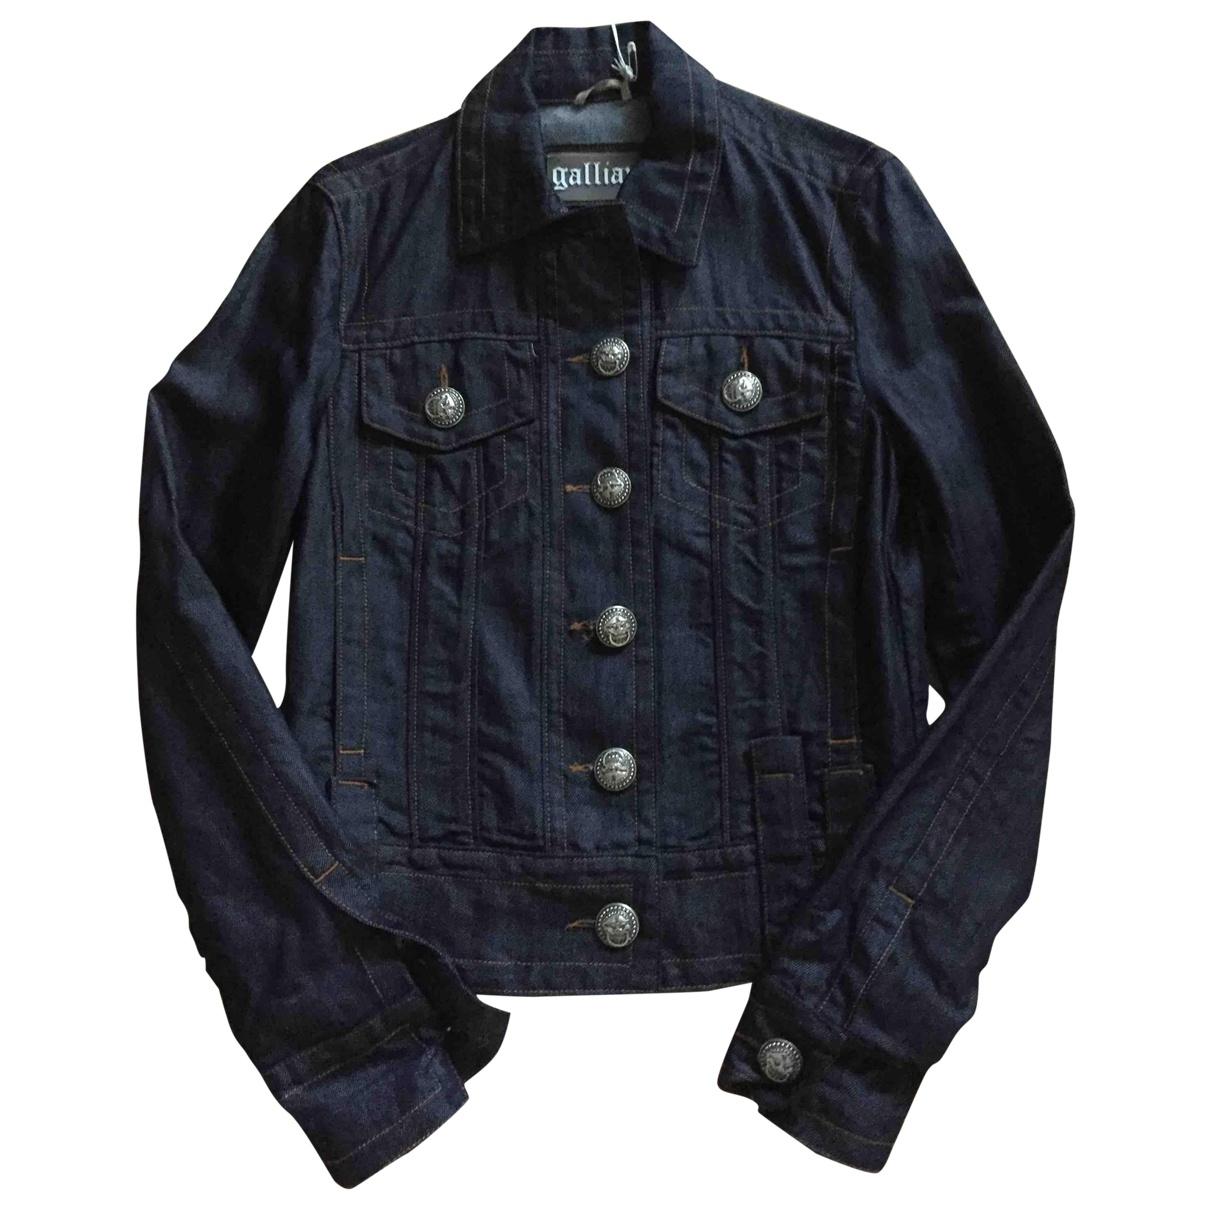 Galliano \N Blue Denim - Jeans jacket for Women 38 FR